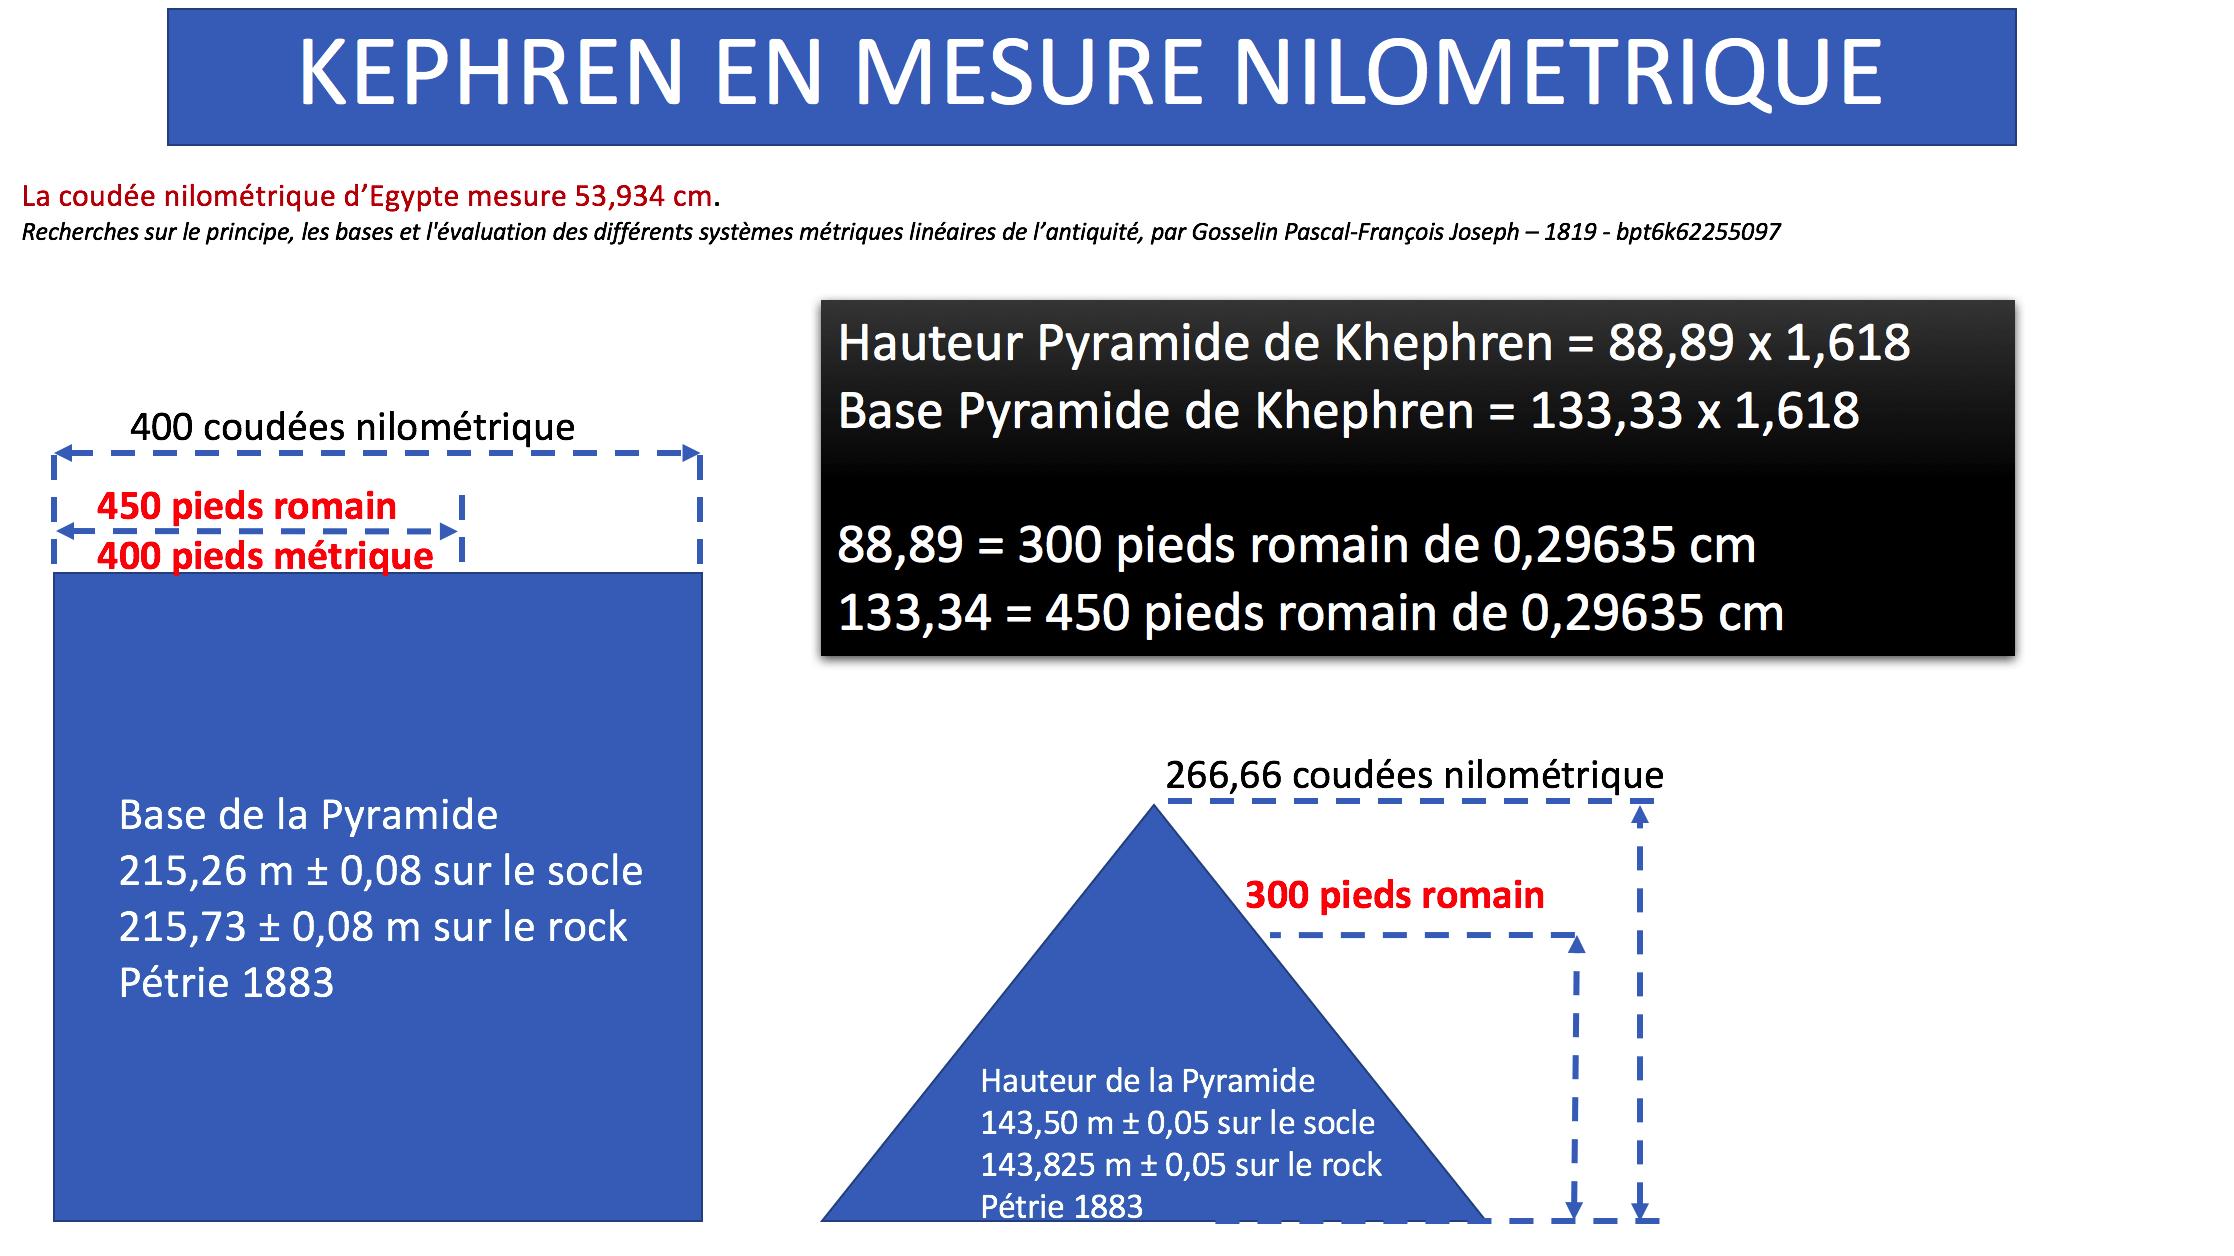 2017-10-18 22:02:31